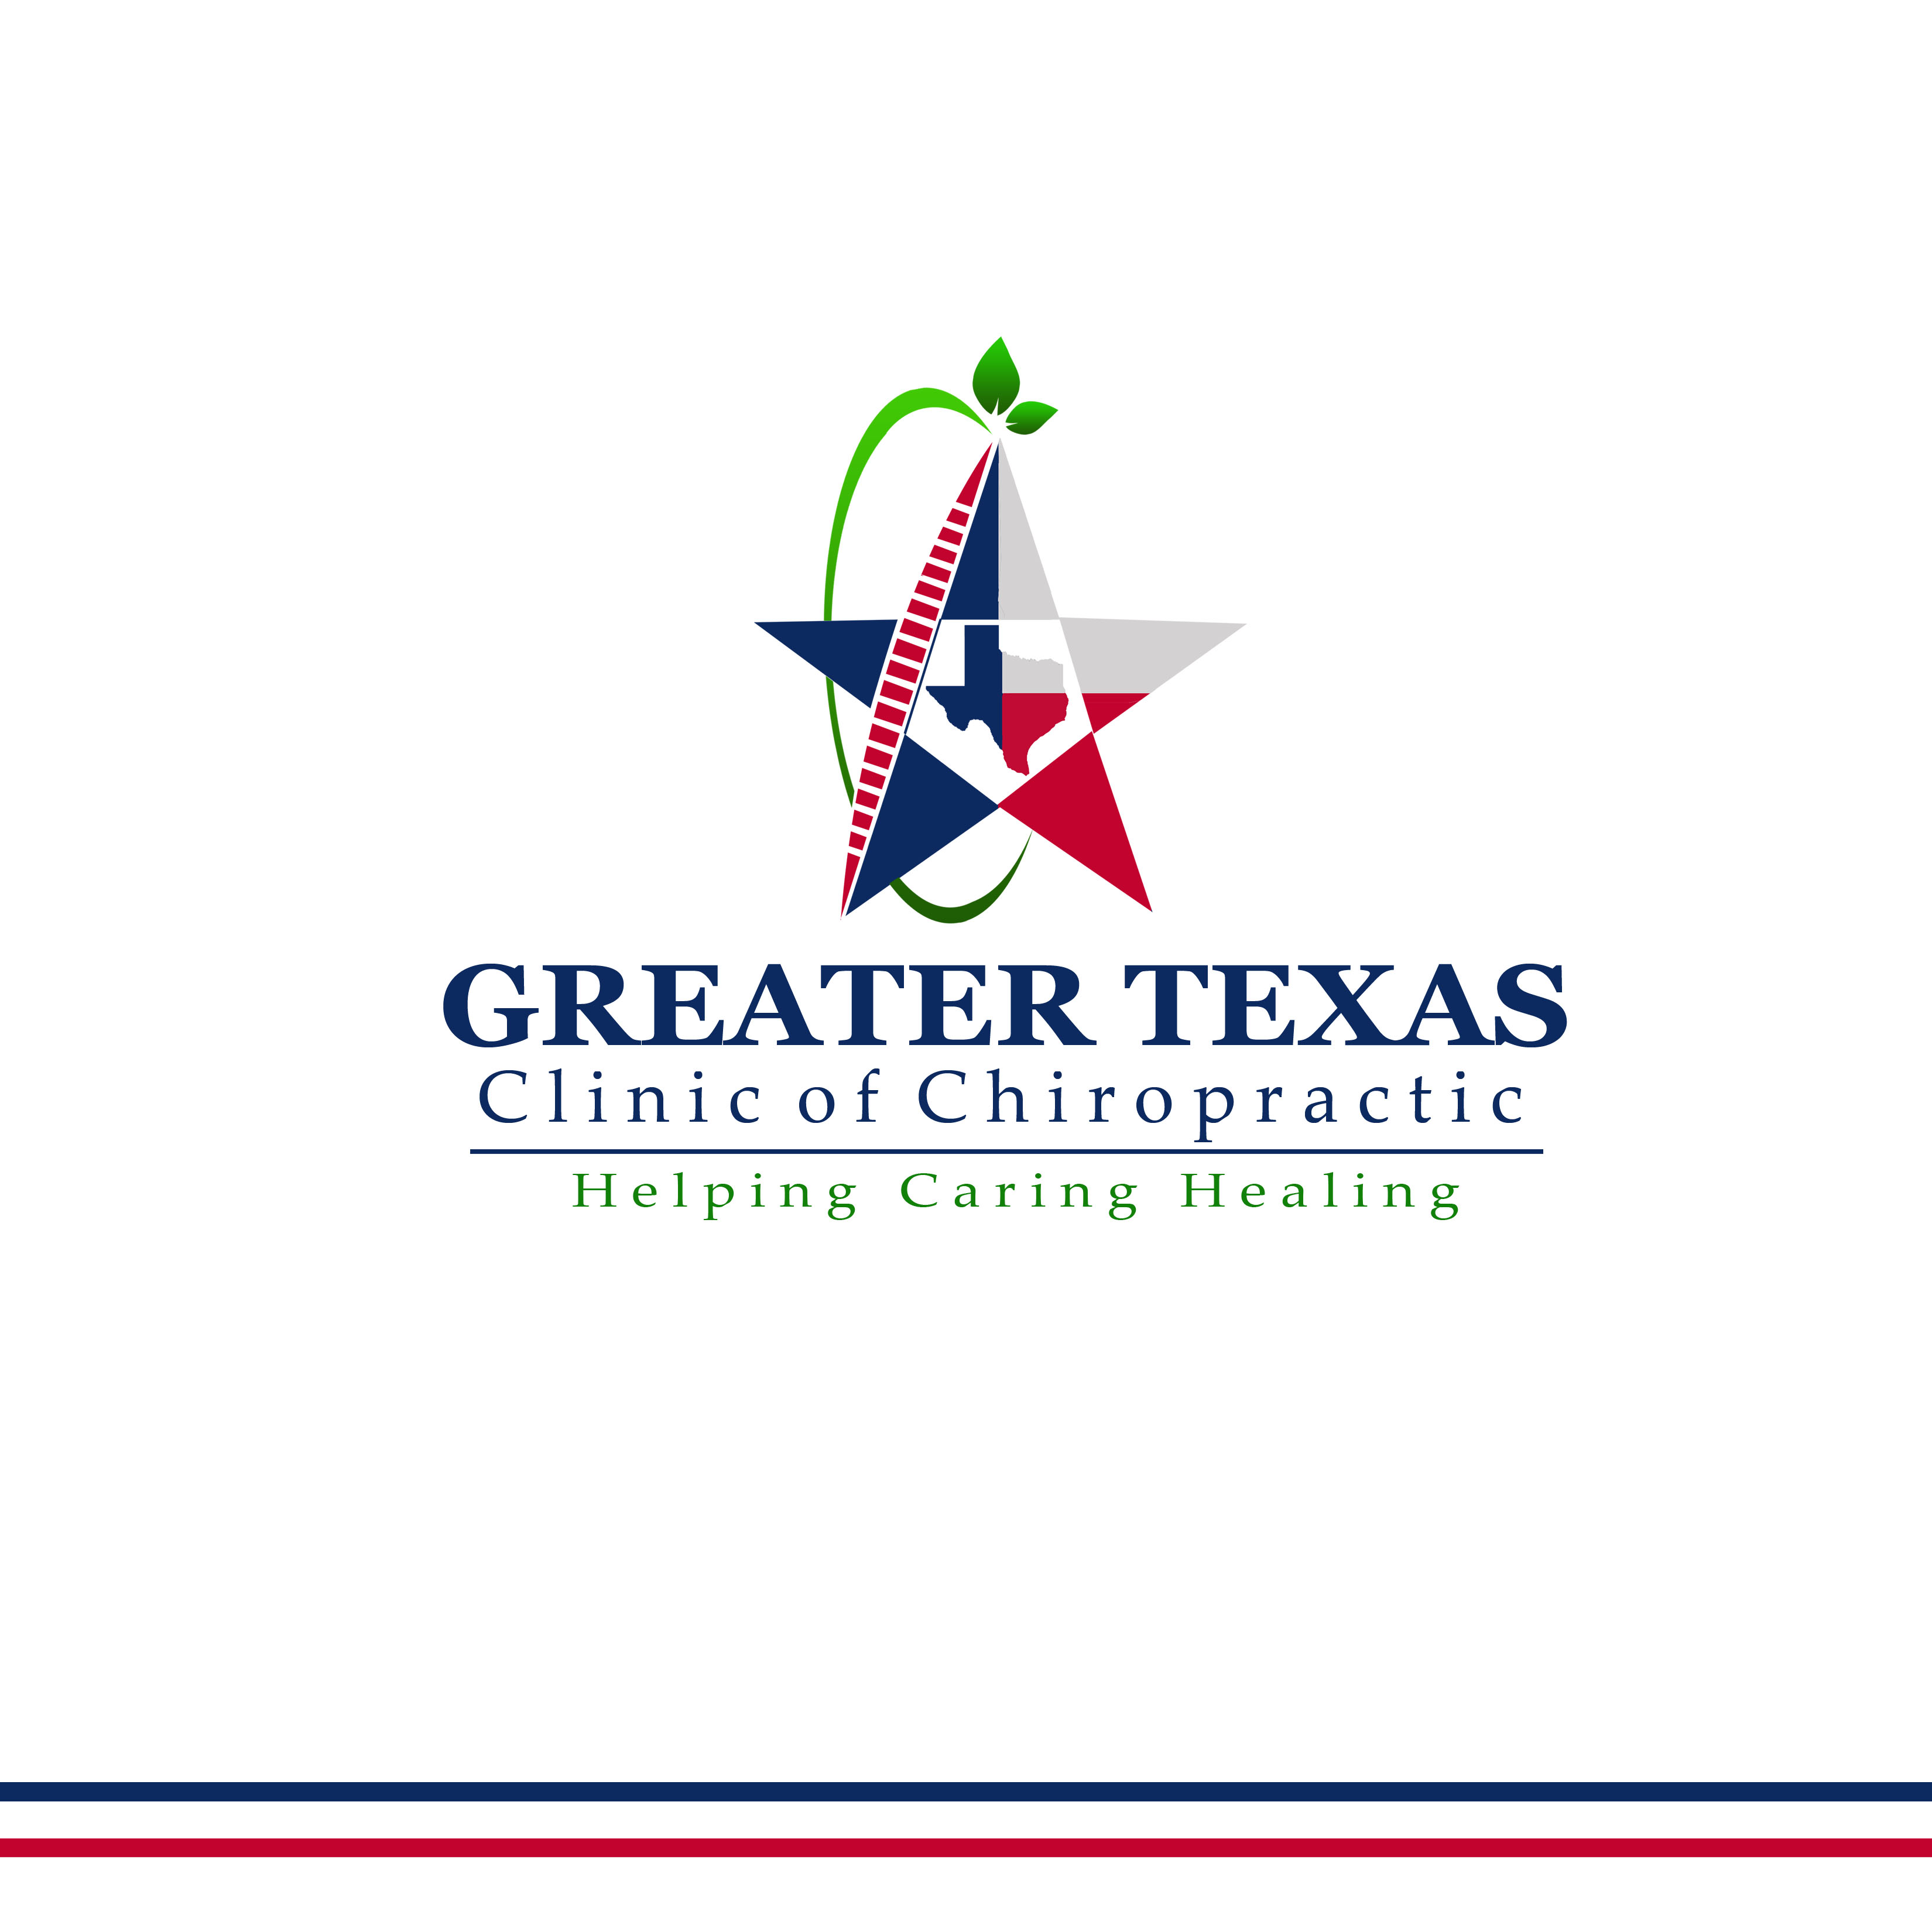 Logo Design by Allan Esclamado - Entry No. 35 in the Logo Design Contest New Logo Design for Greater Texas Clinic of Chiropractic.